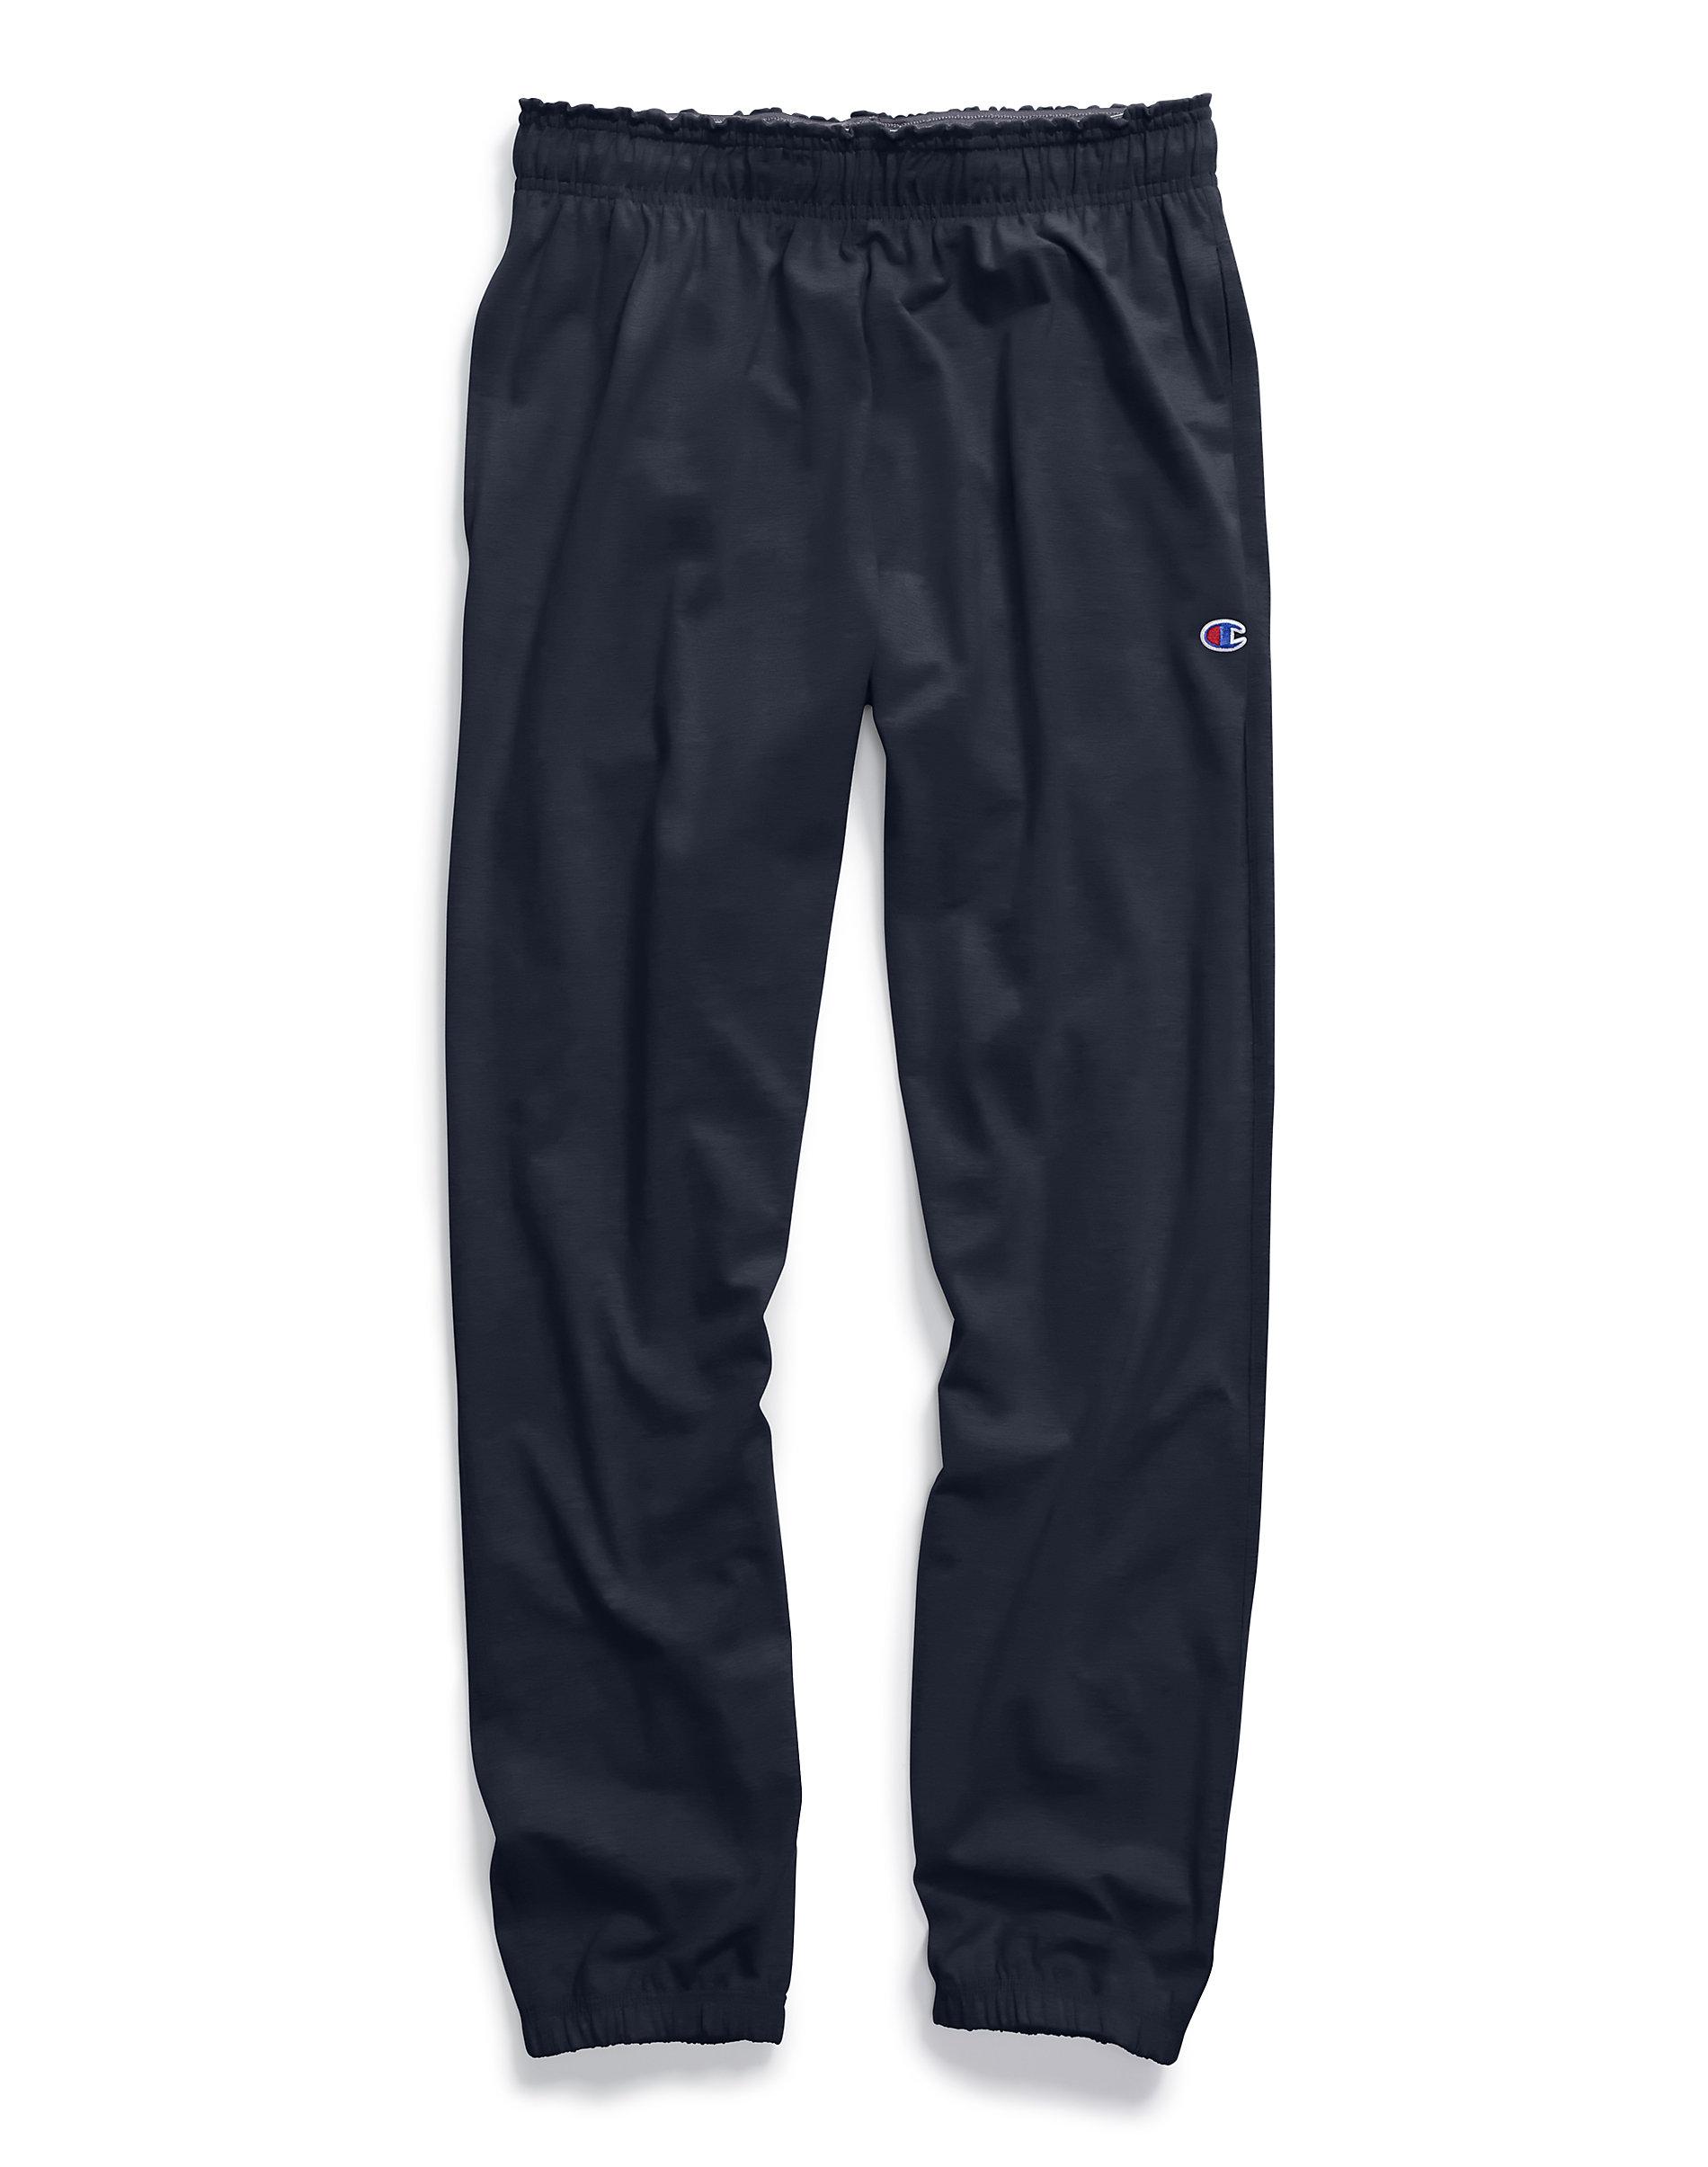 Champion Authentic Men/'s Athletic Pants Closed Bottom Jersey Sweatpants Workout